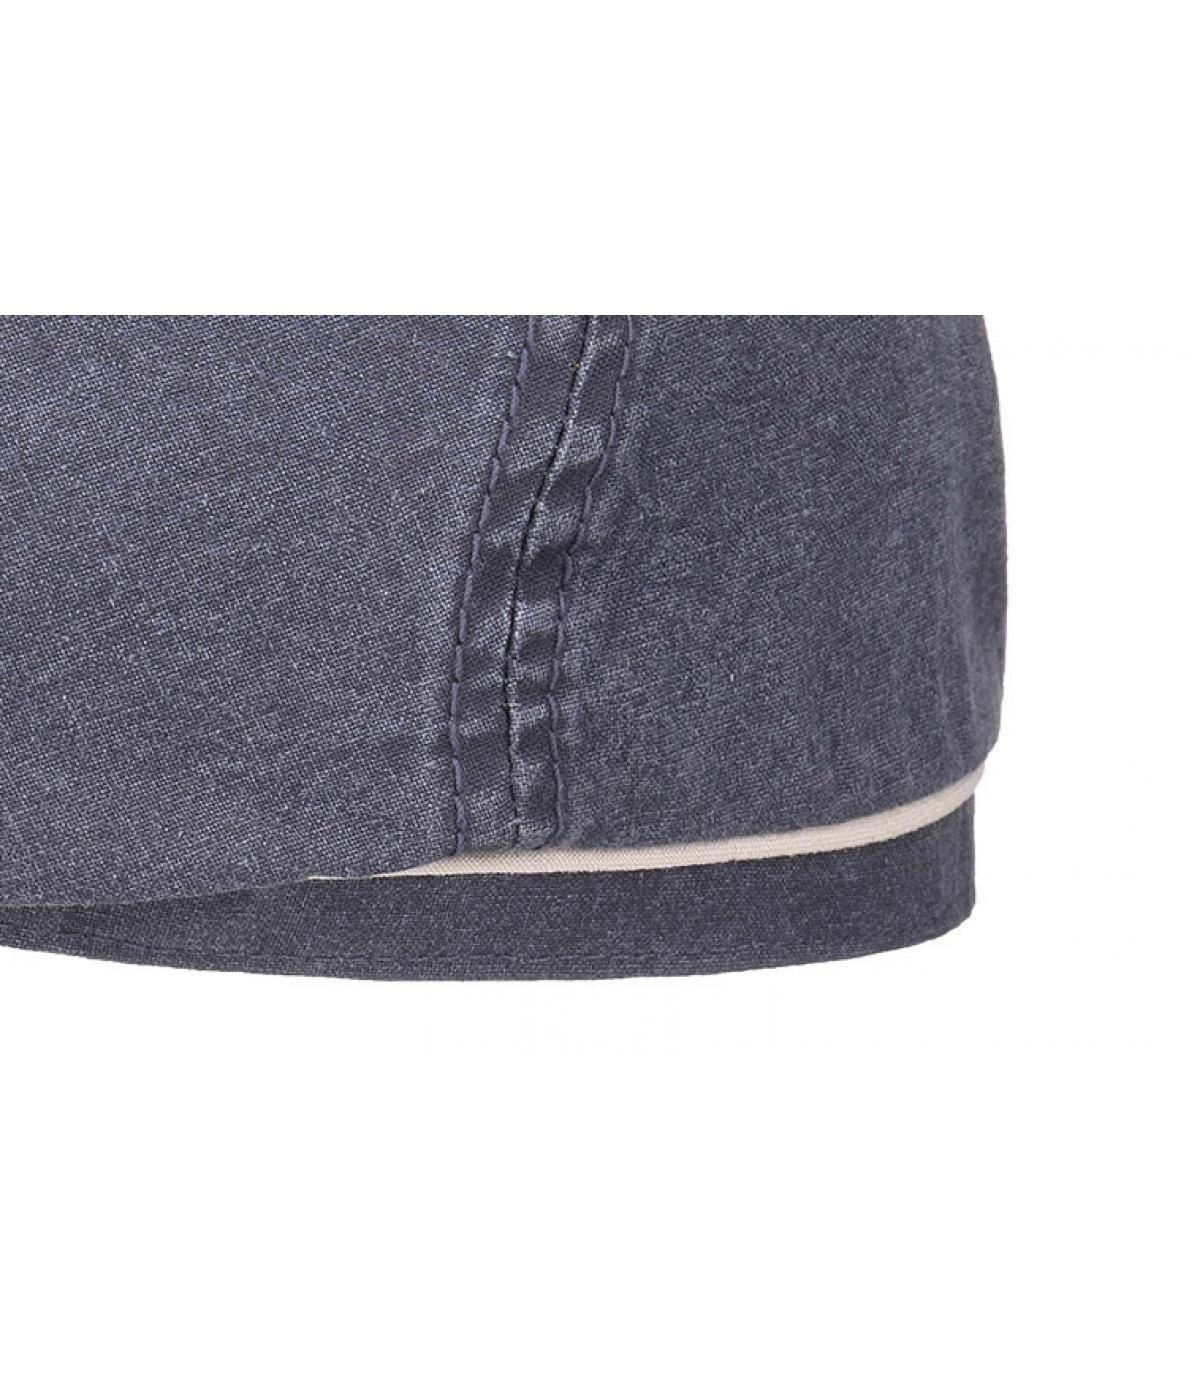 Détails Brooklyn cap delave coton organic bleu - image 3